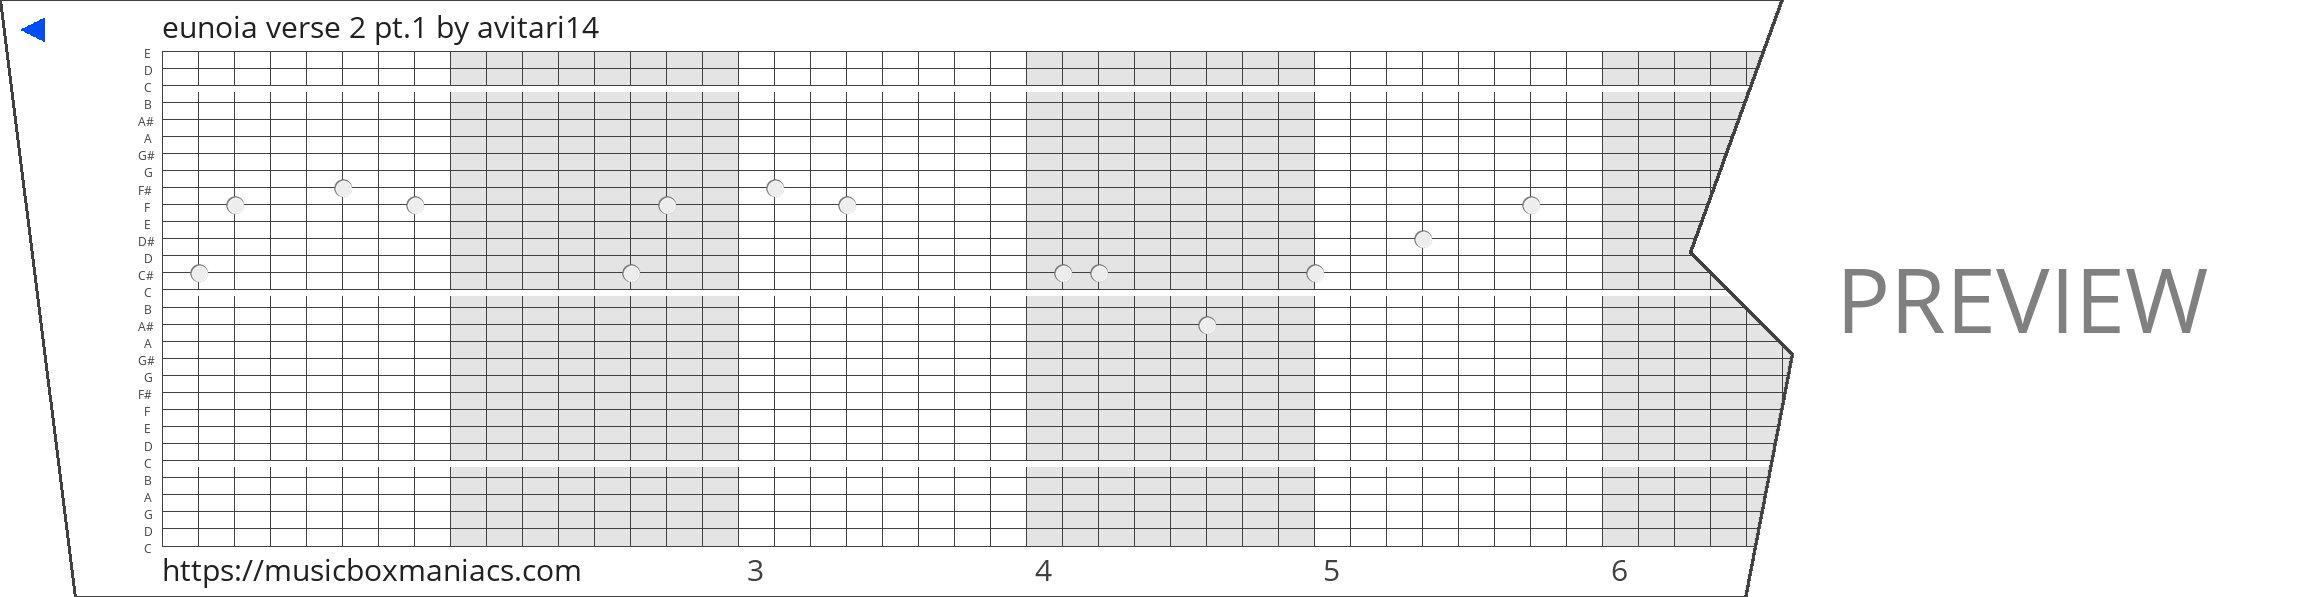 eunoia verse 2 pt.1 30 note music box paper strip